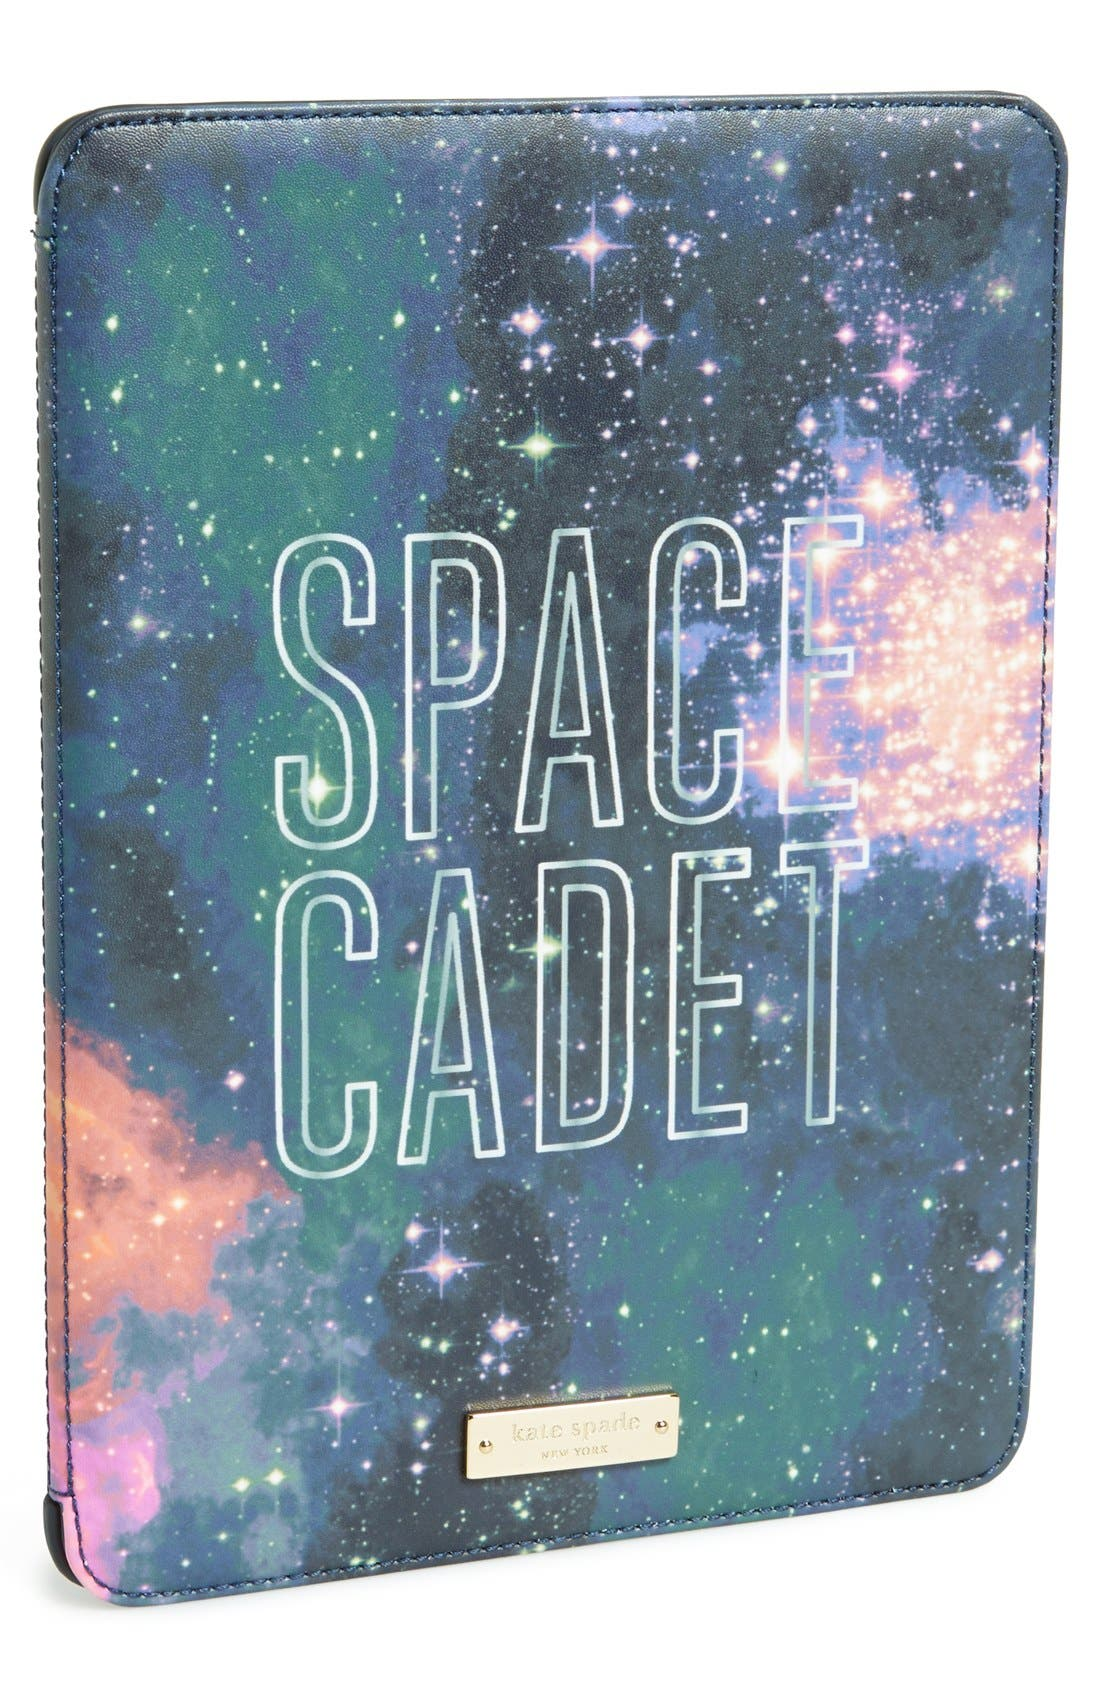 Main Image - kate spade new york 'space cadet' print iPad Air hardcase folio